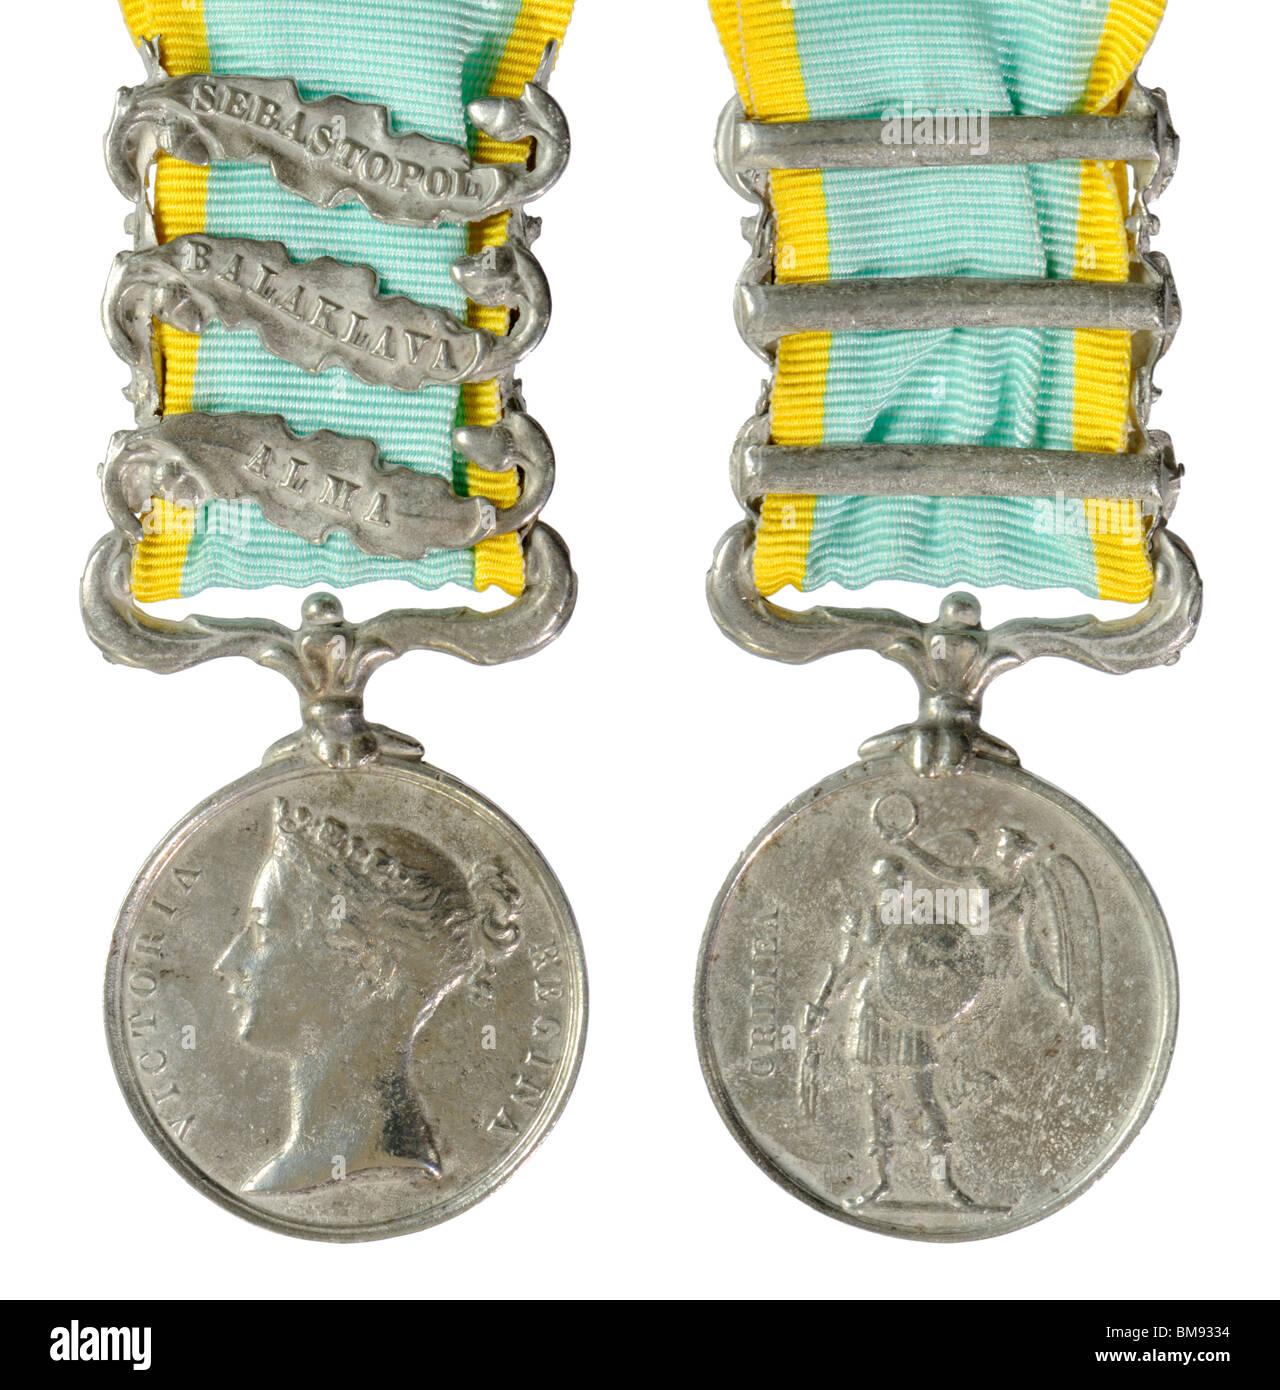 Crimean War Medal (Replica) with Sebastopol, Balaklava and Alma clasps - Stock Image